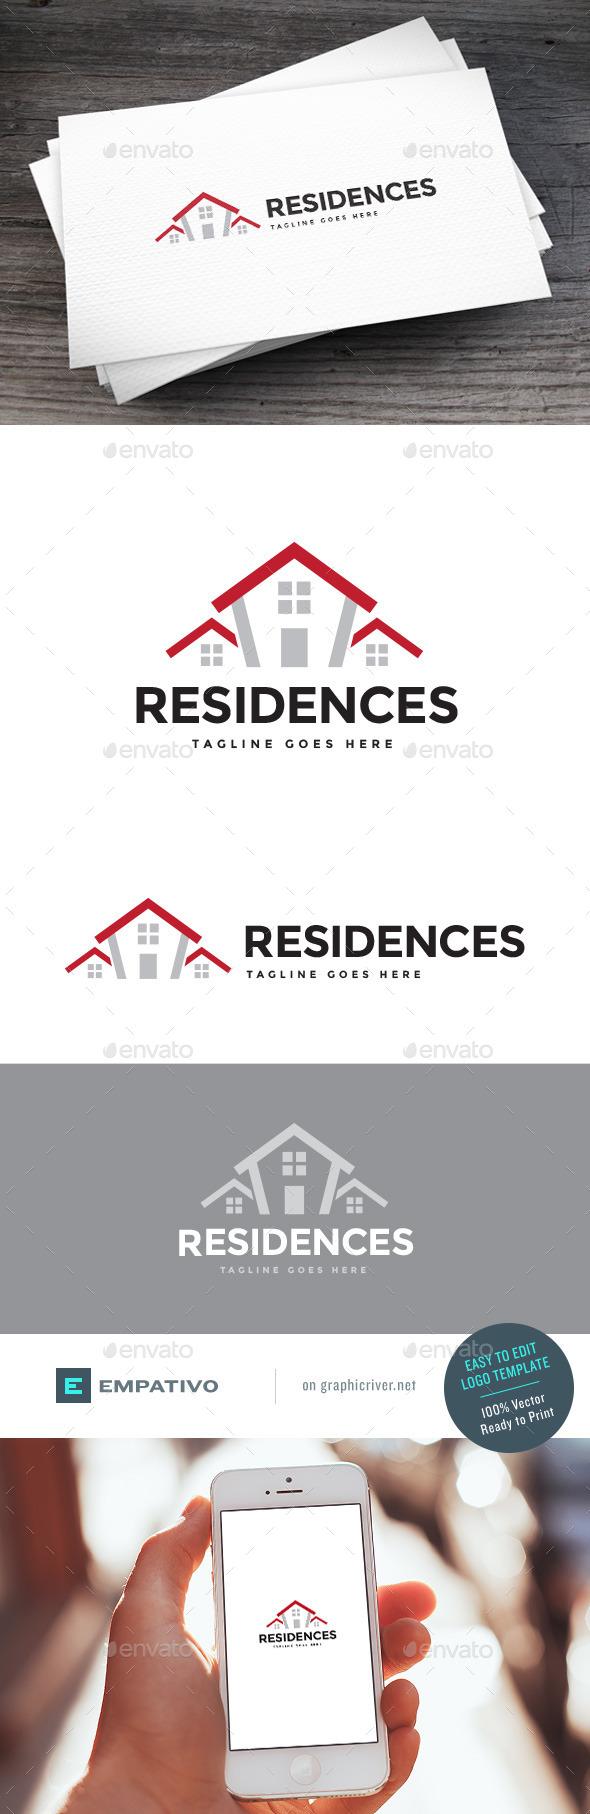 GraphicRiver Residences Logo Template 11307417